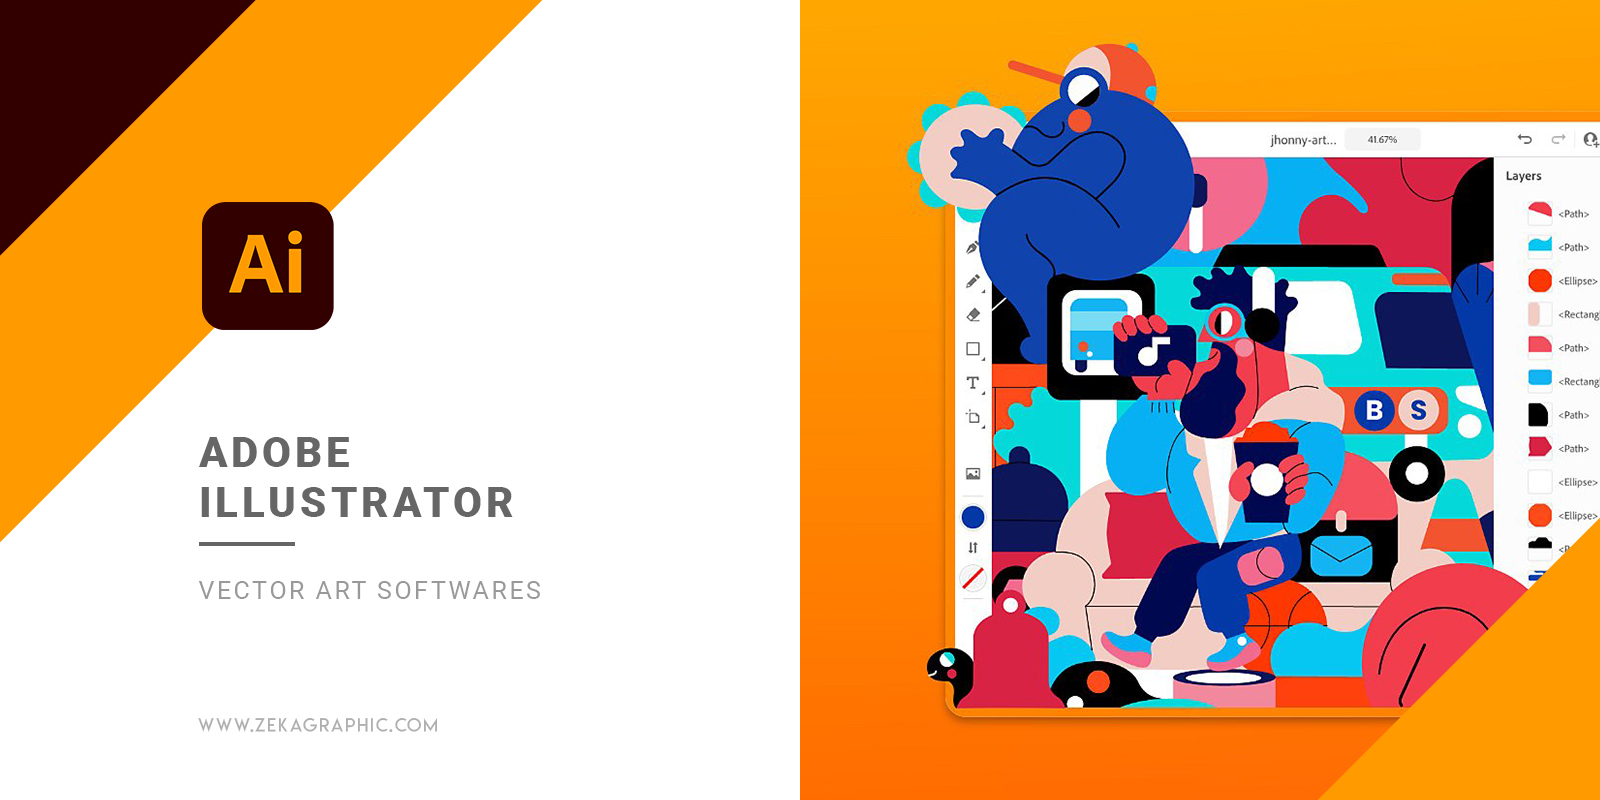 Adobe Illustrator Graphic Design Software For Vector Art